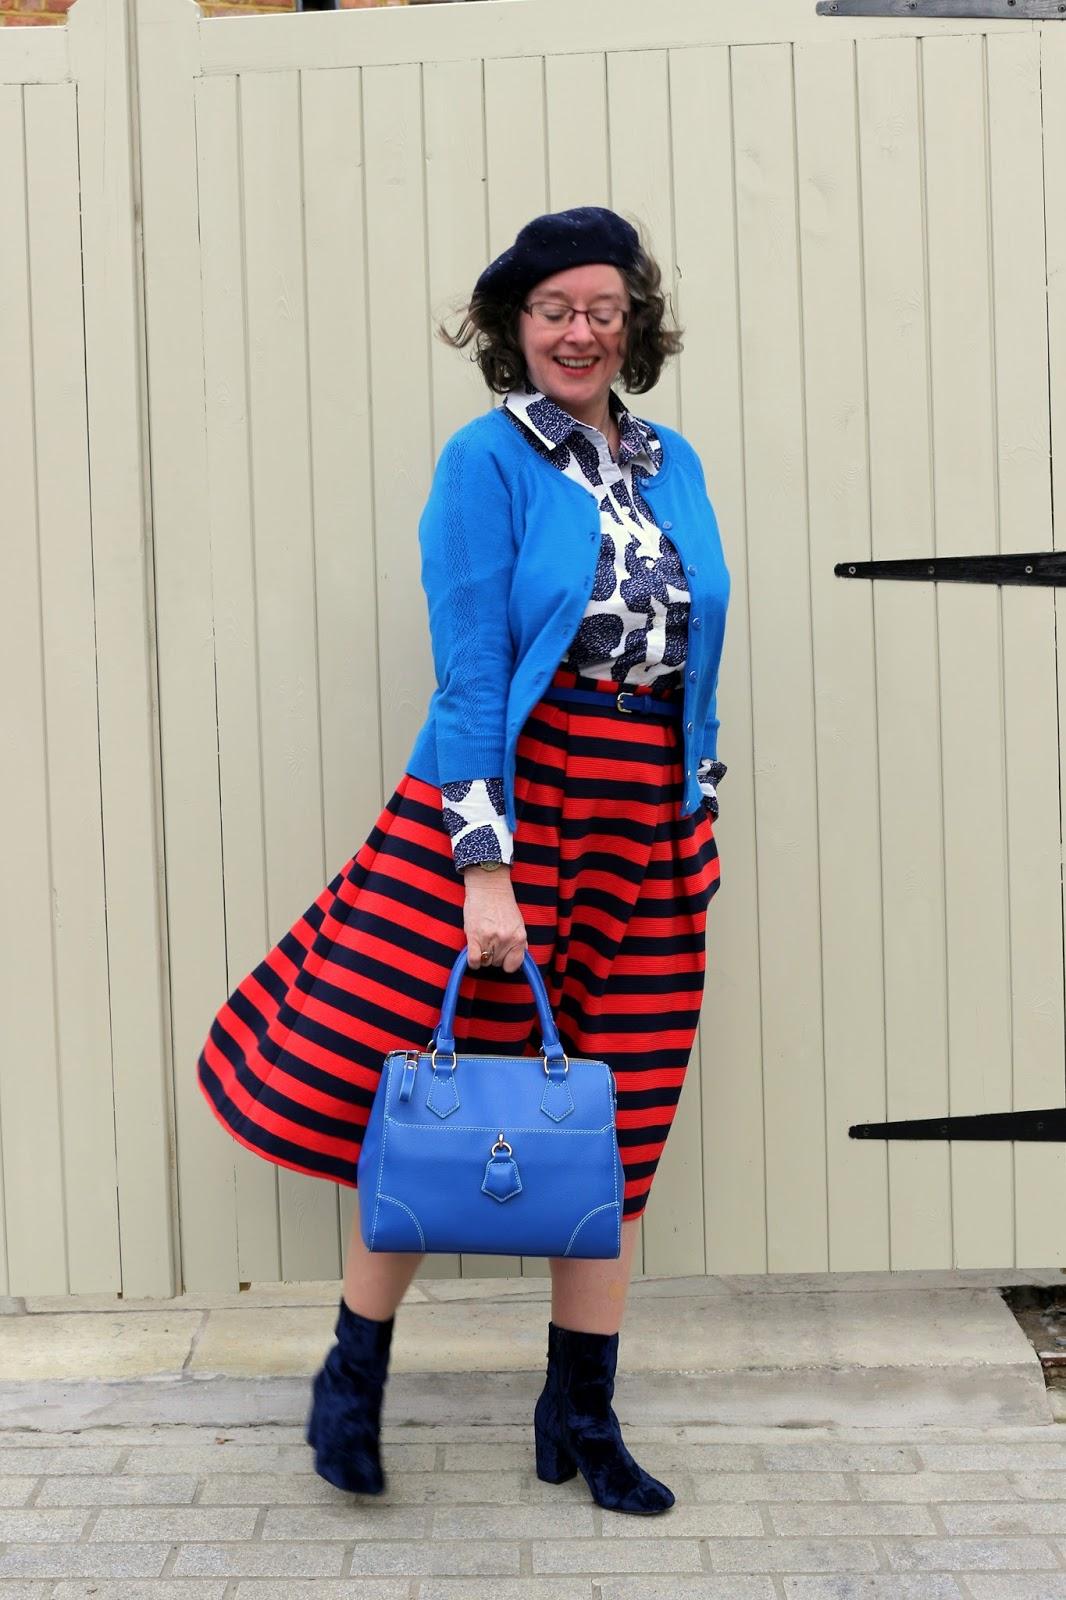 Patterning Mixing a Midi Skirt | Boden Maggie Ottoman Skirt, Boden Shirt, Velvet Boots | Petite Silver Vixen